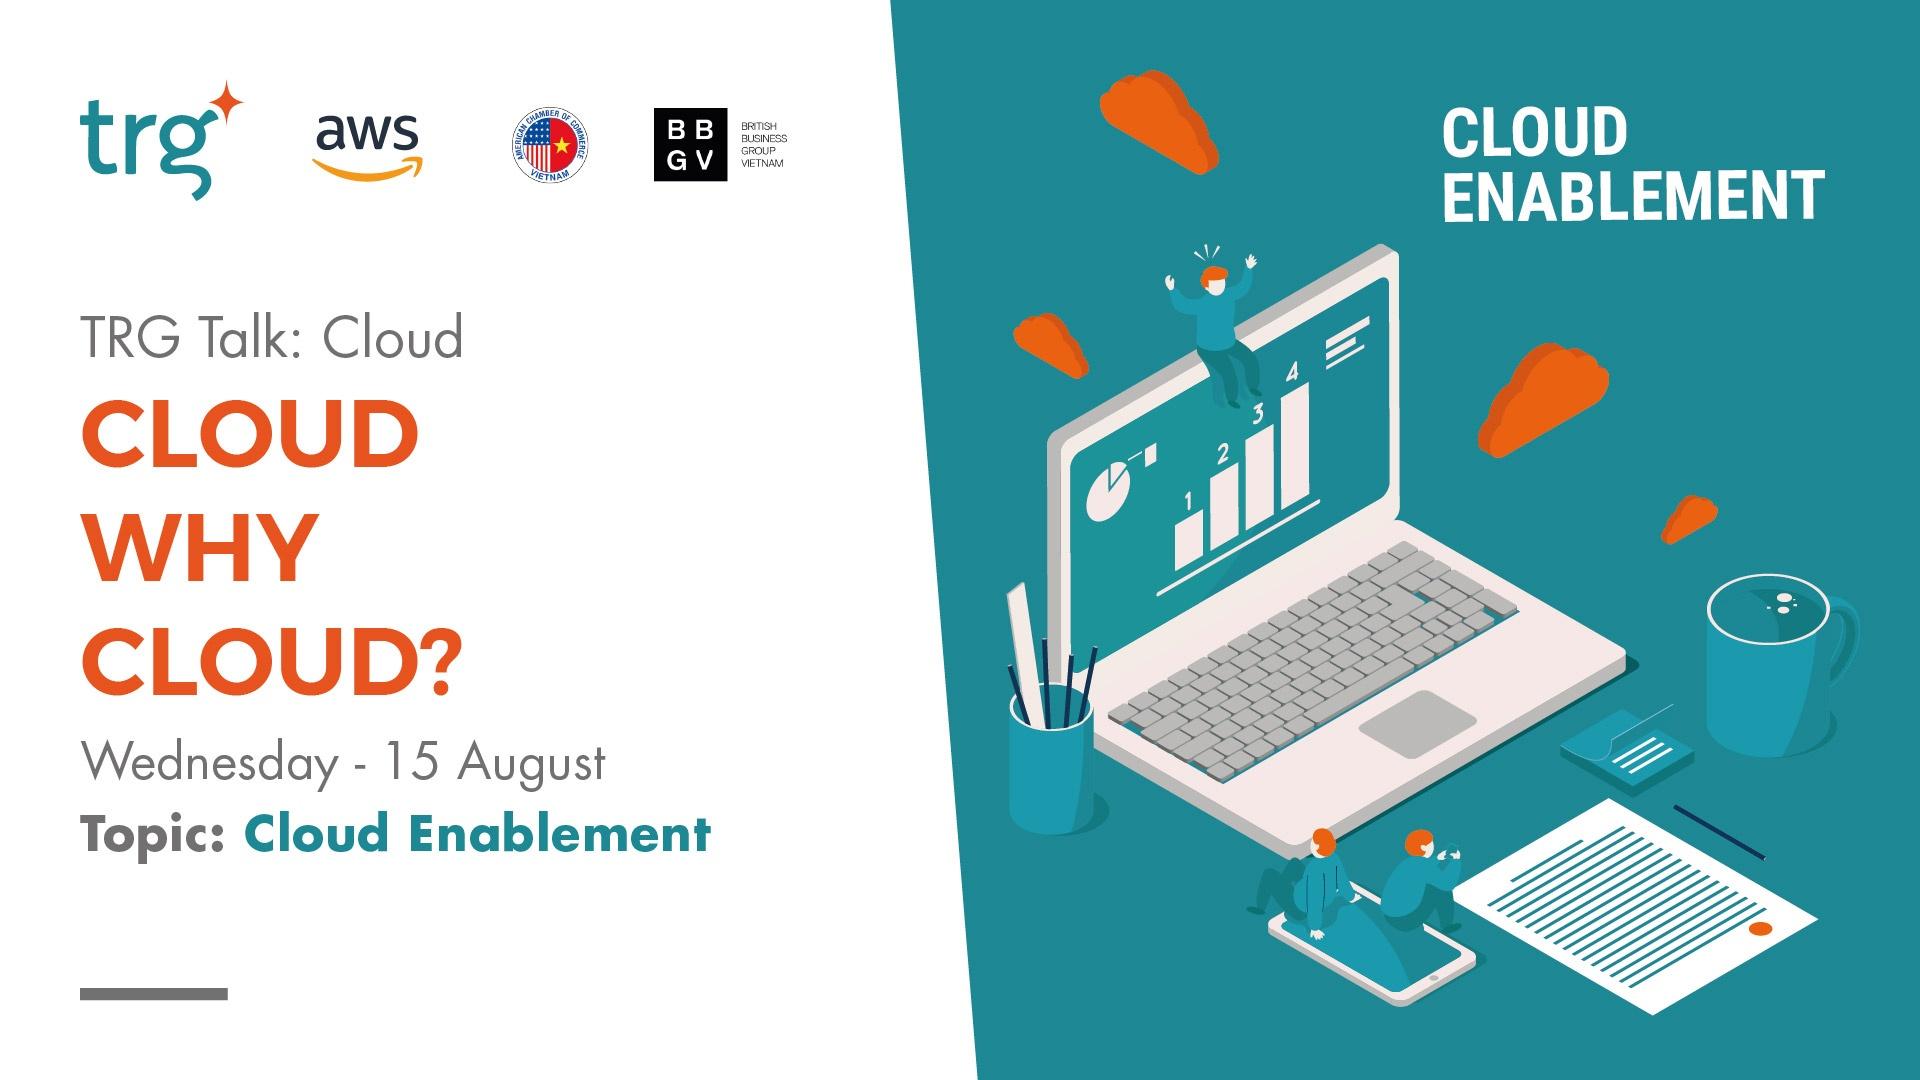 TRG Talk Cloud Aug 2018